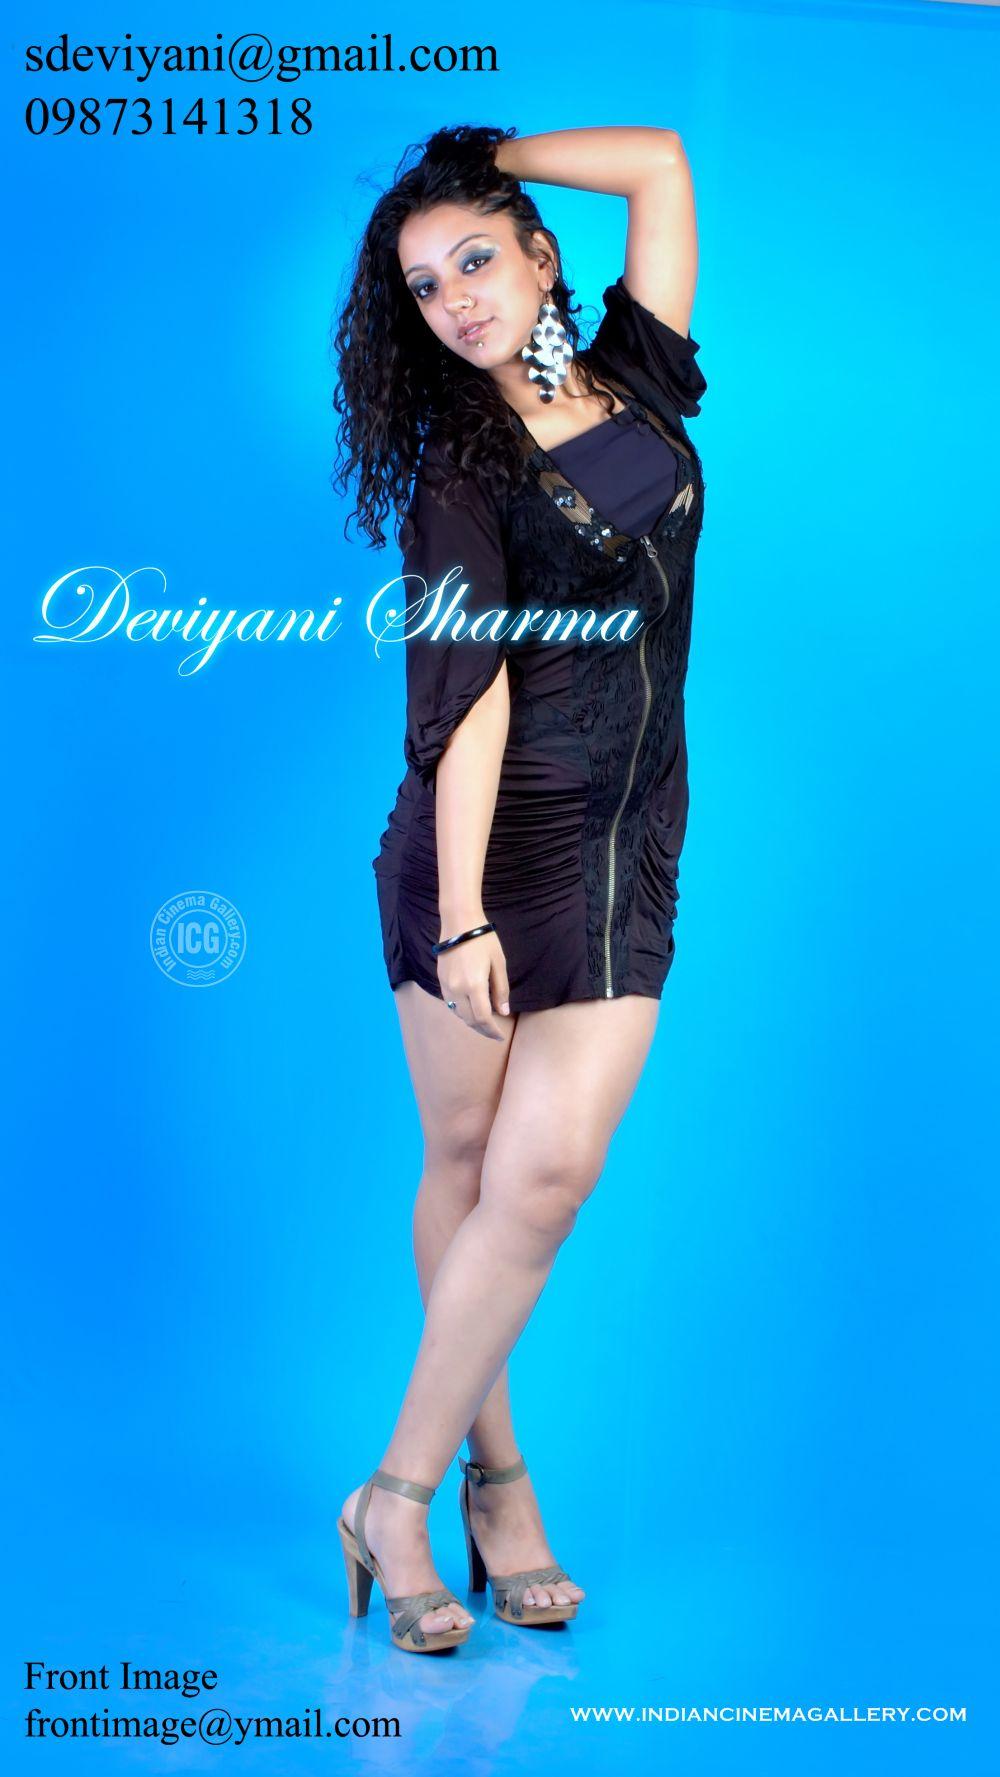 deviyani-sharma-stills-14953